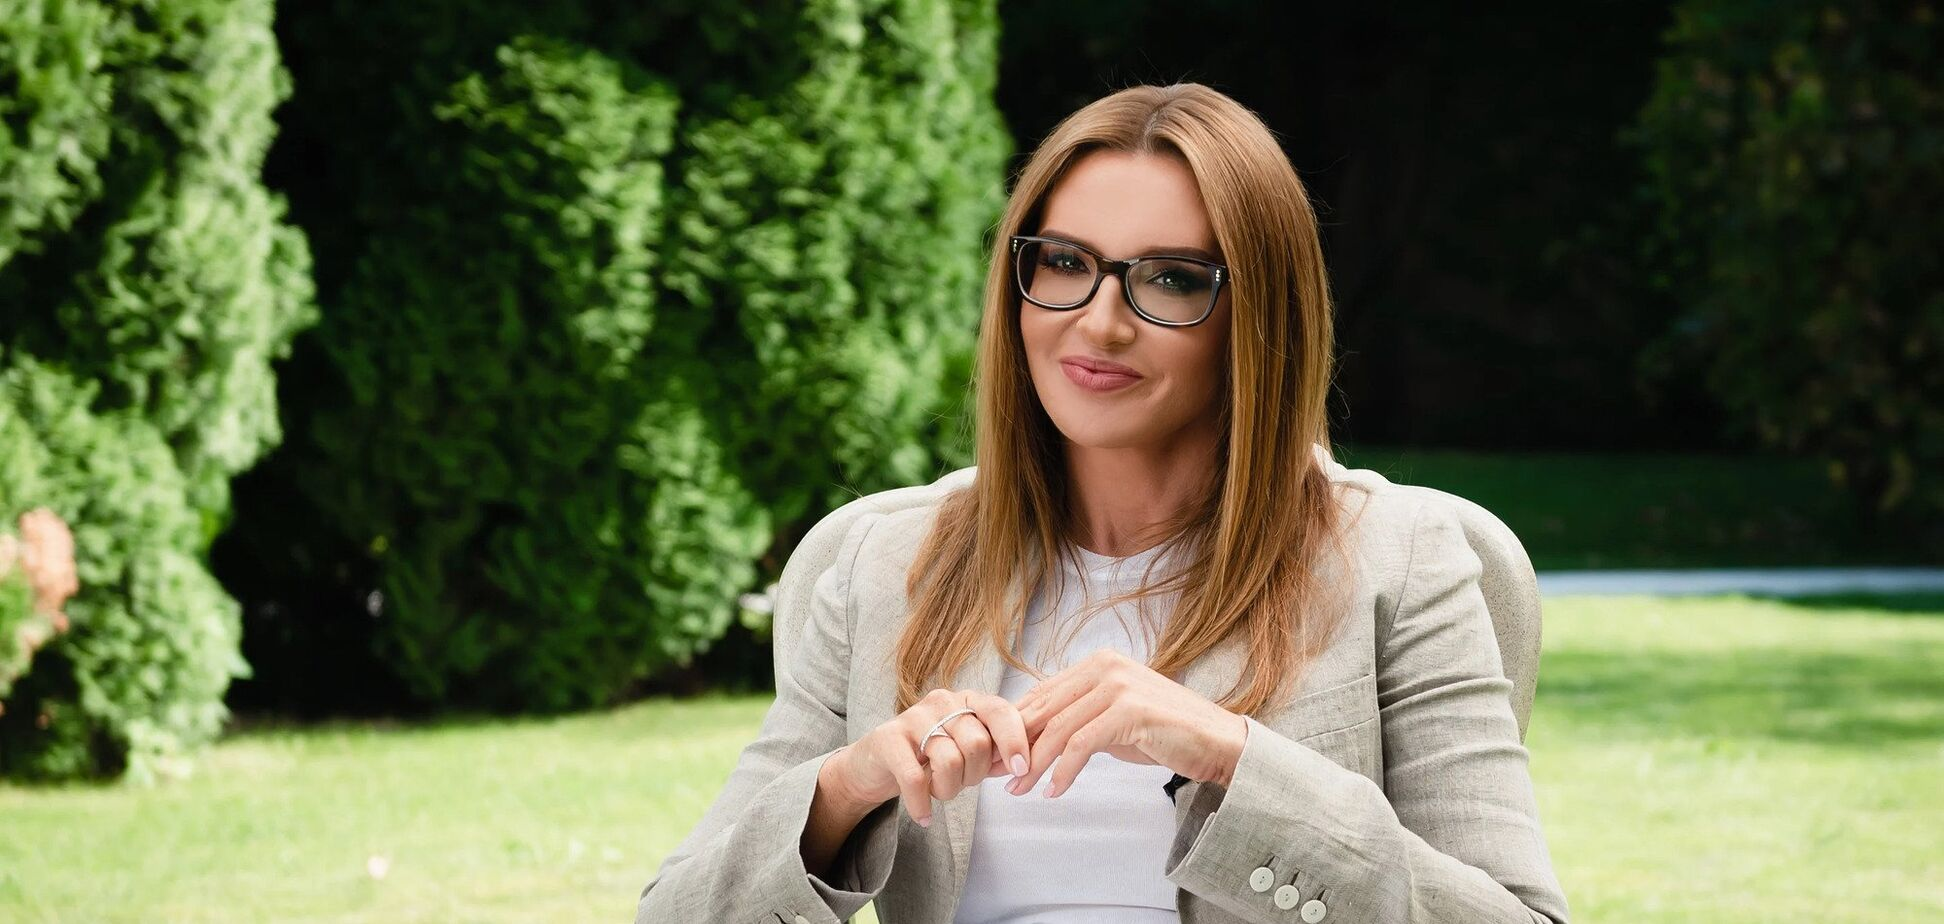 Оксана Марченко высказалась против Хэллоуина